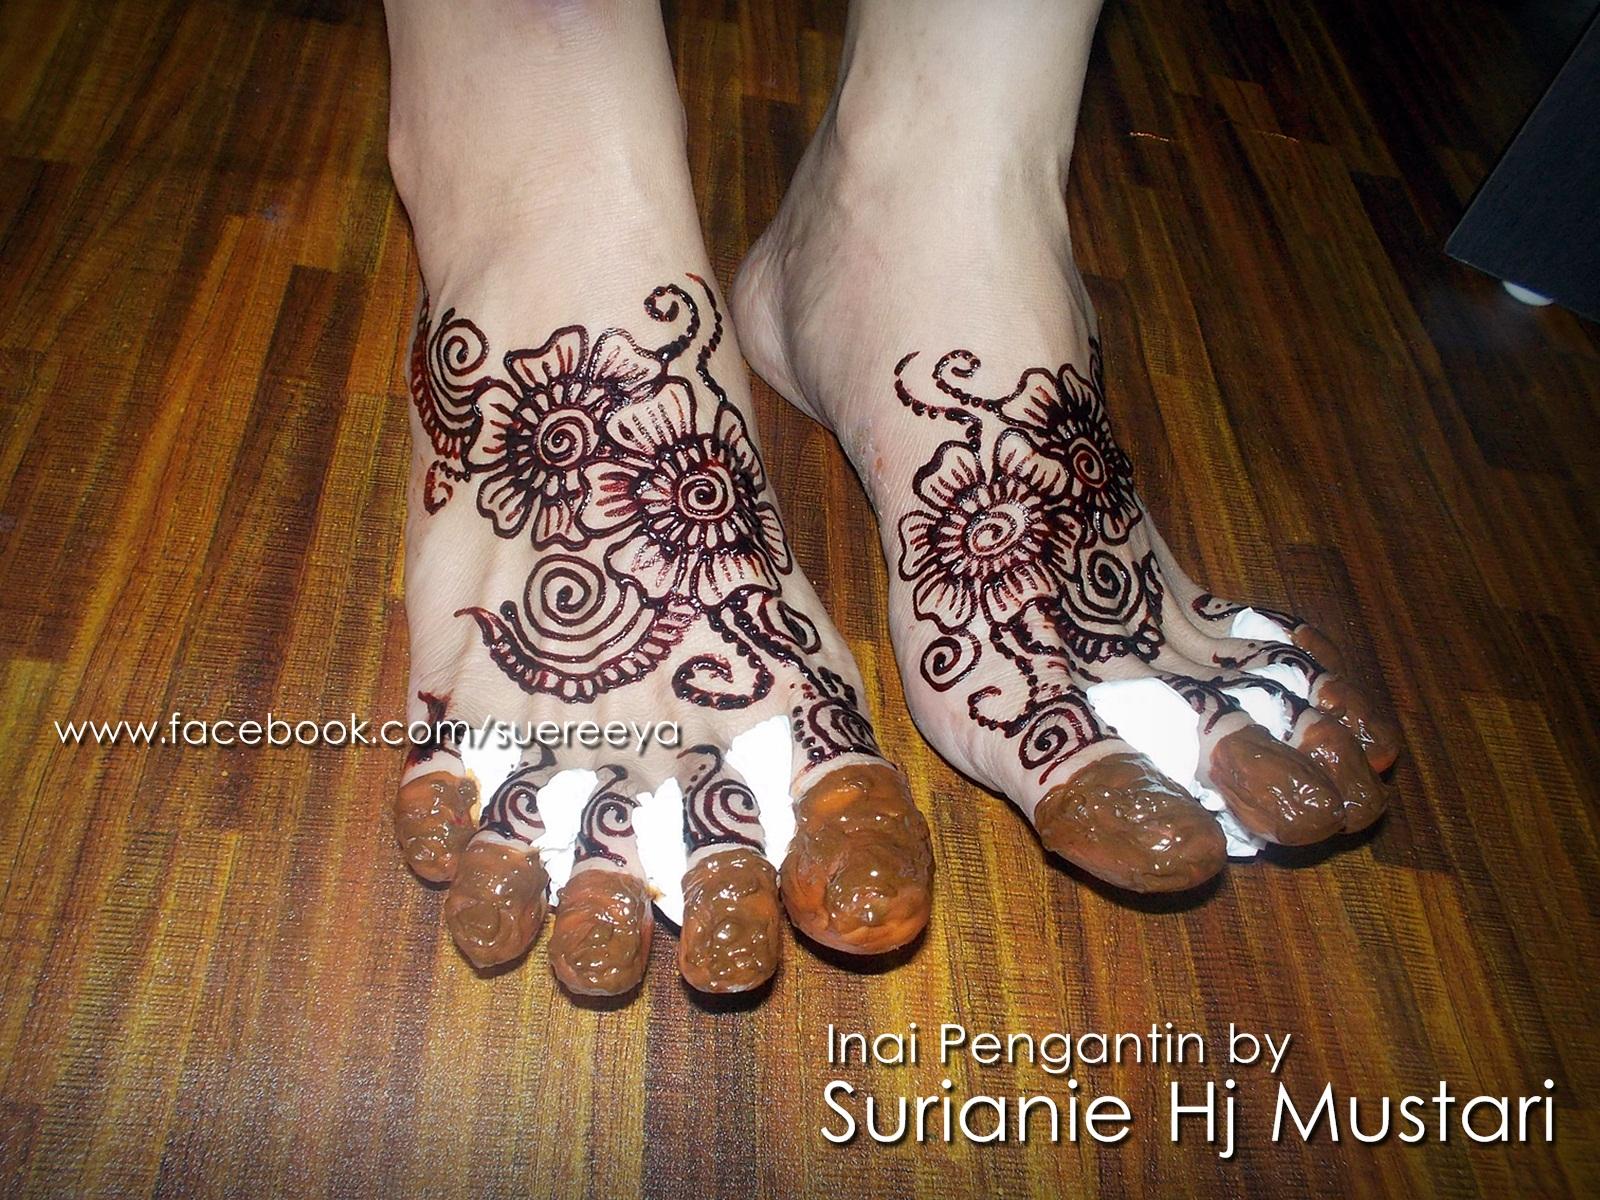 A HENNA ARTIST39S DIARY Inai Pengantin For Noorhamizah39s Sister At